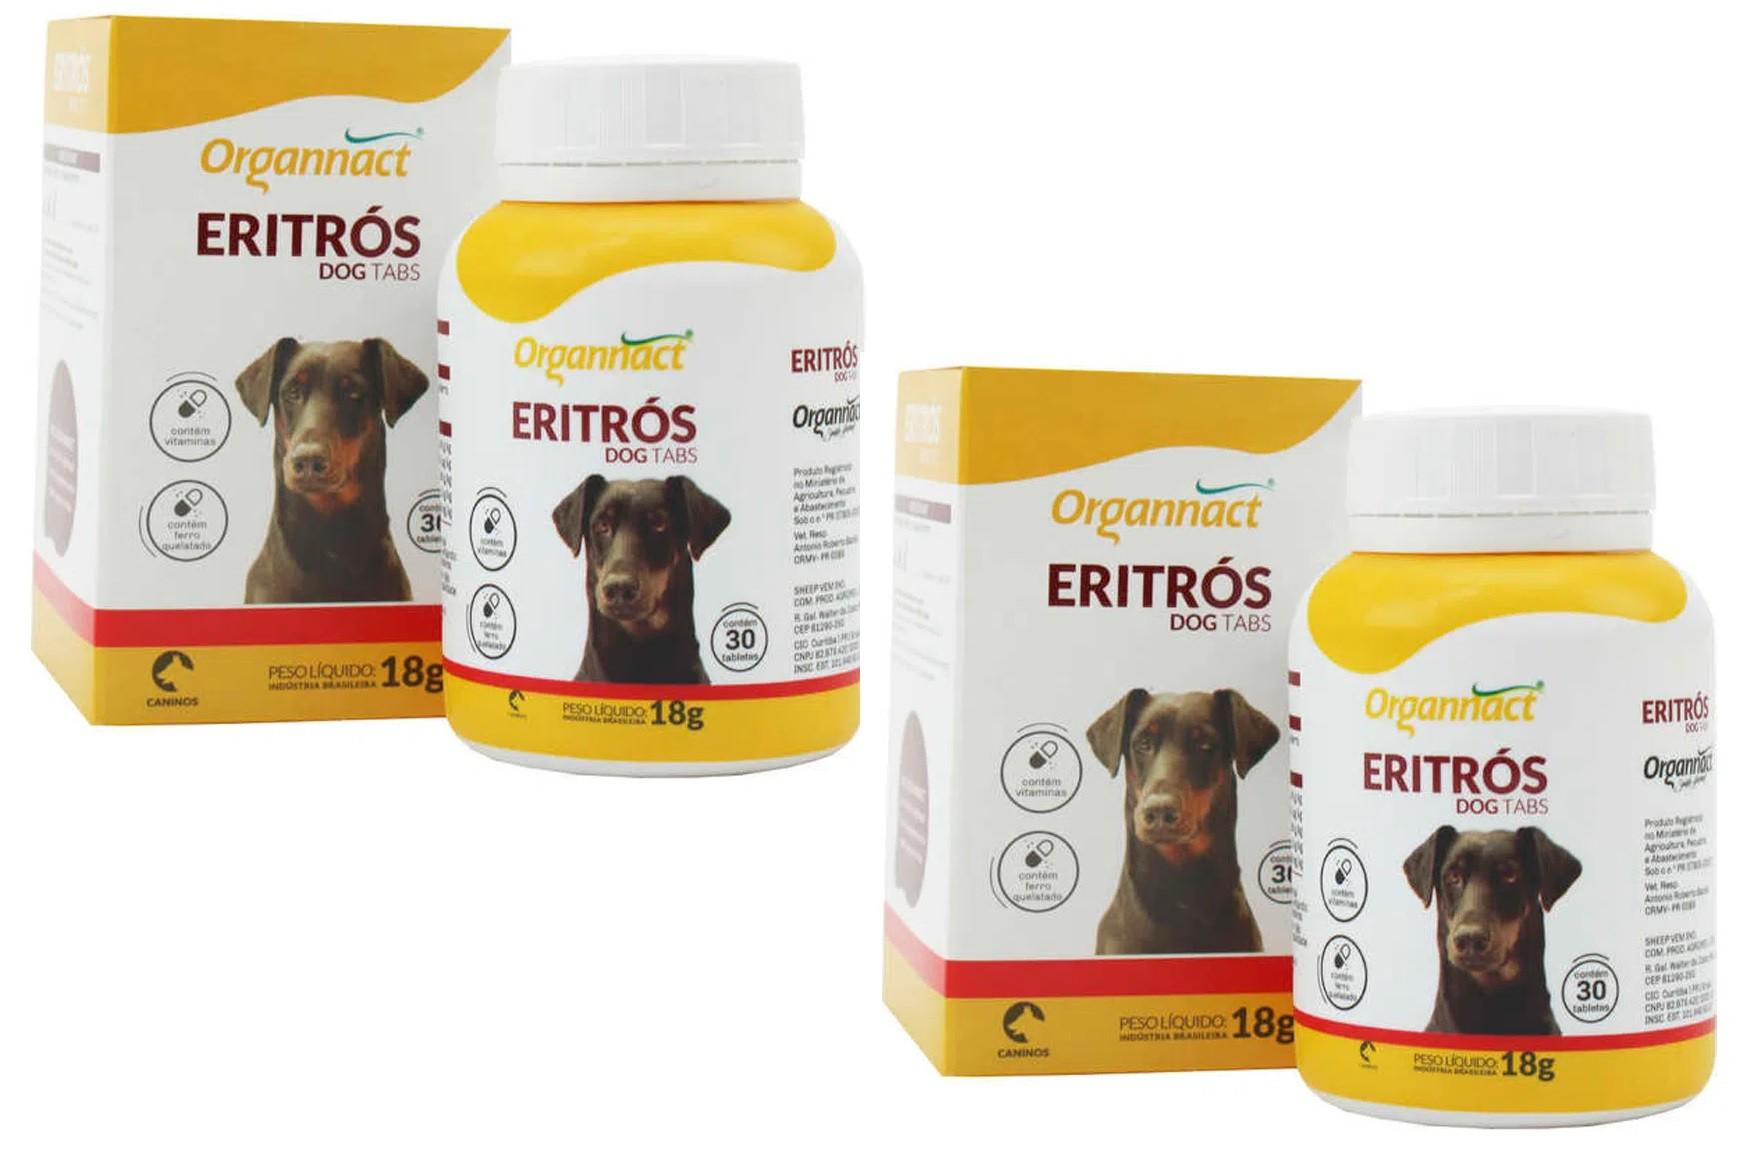 Kit 2 Unidades Eritros Dog Tabs 18g (30 Tabletes) - Organnact